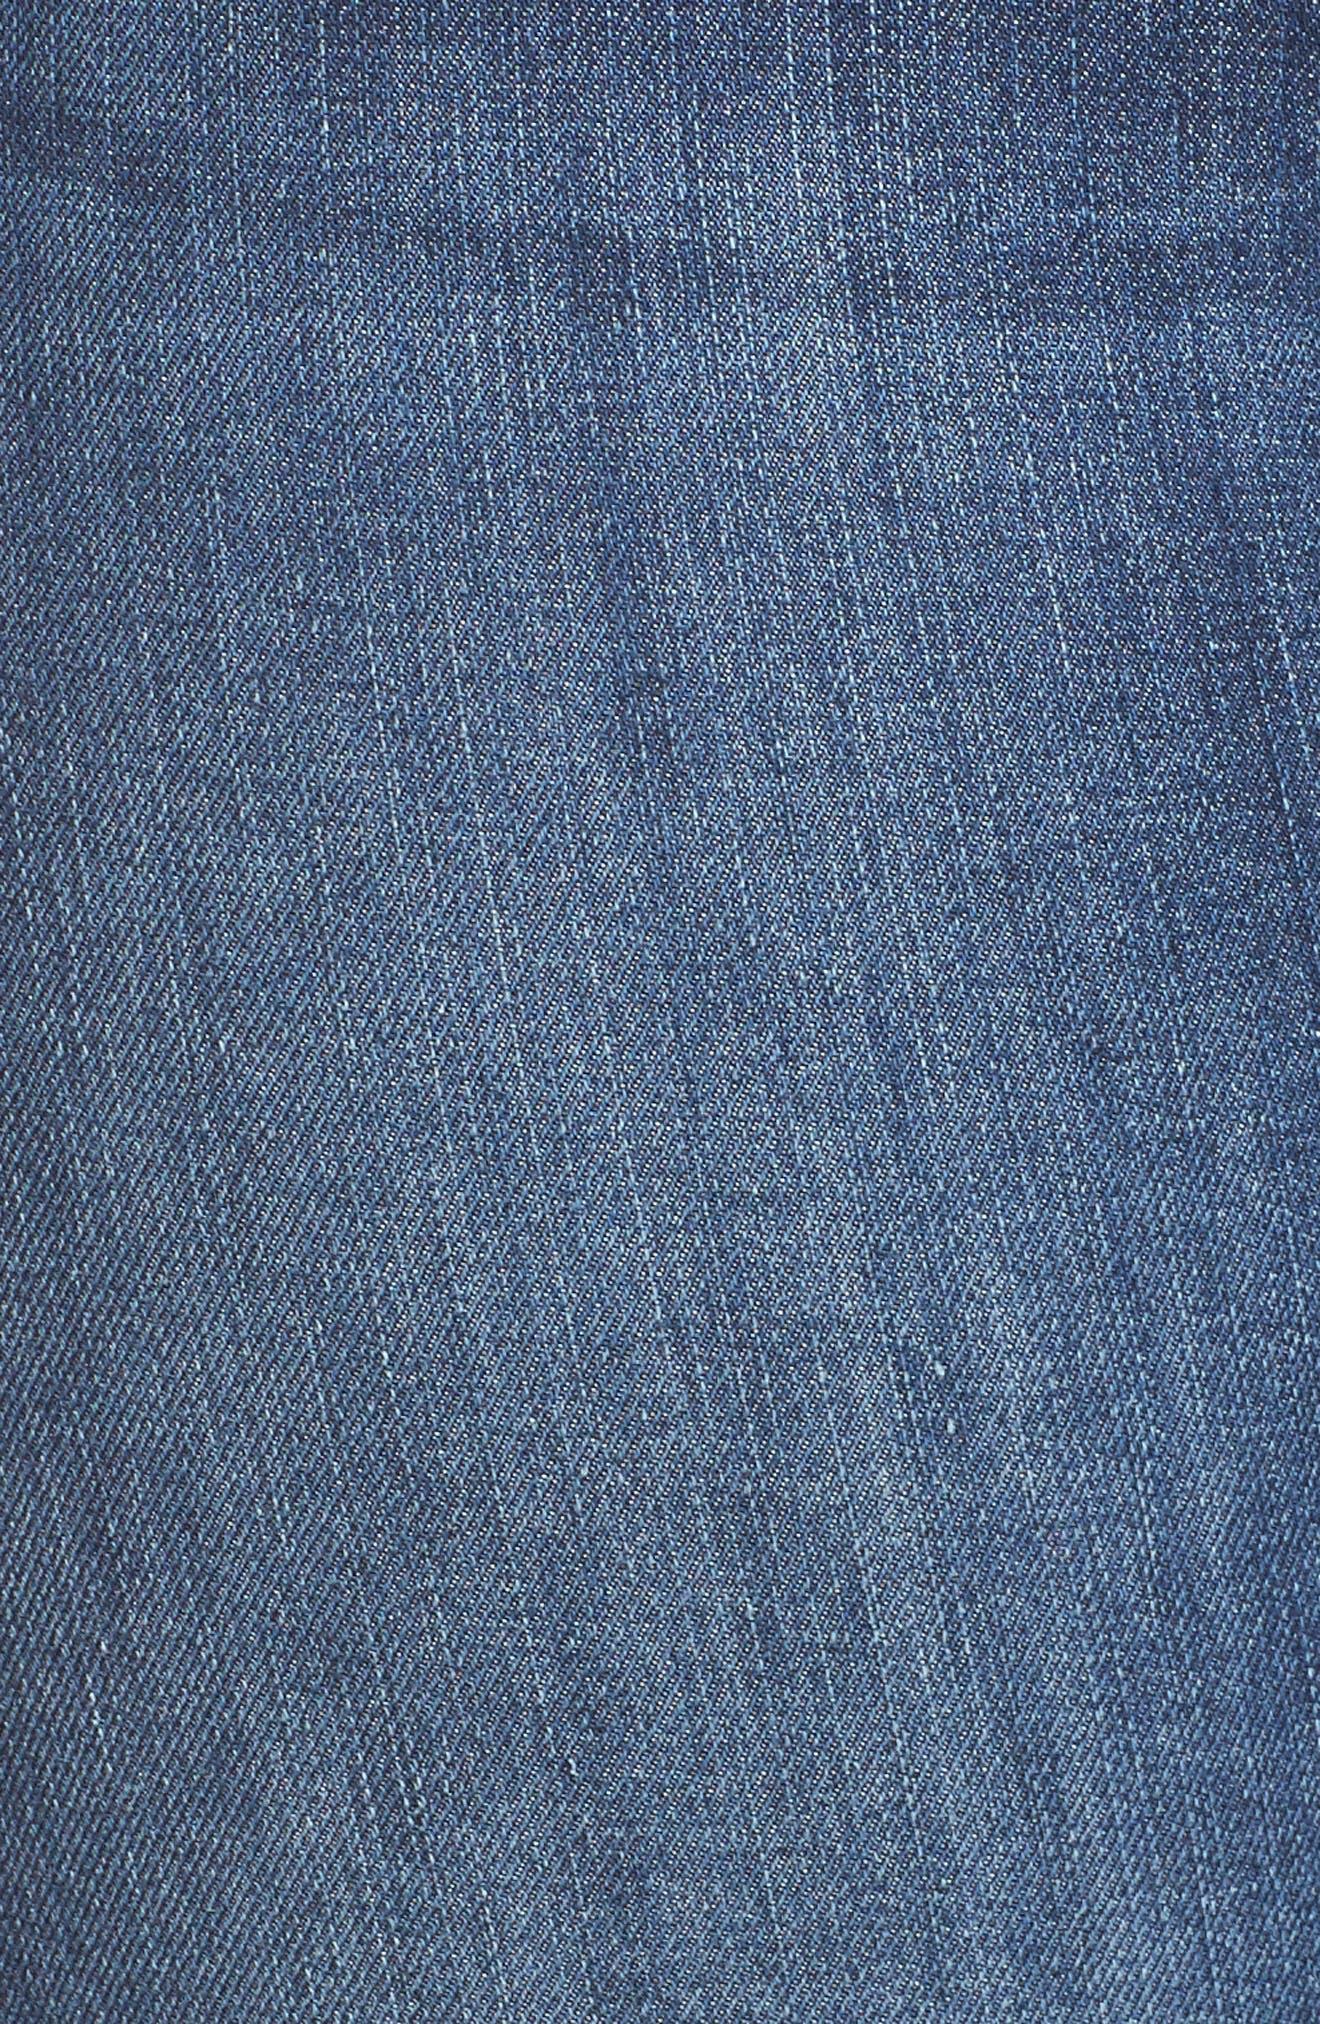 Good Legs High Rise Skinny Jeans,                             Alternate thumbnail 10, color,                             BLUE 004